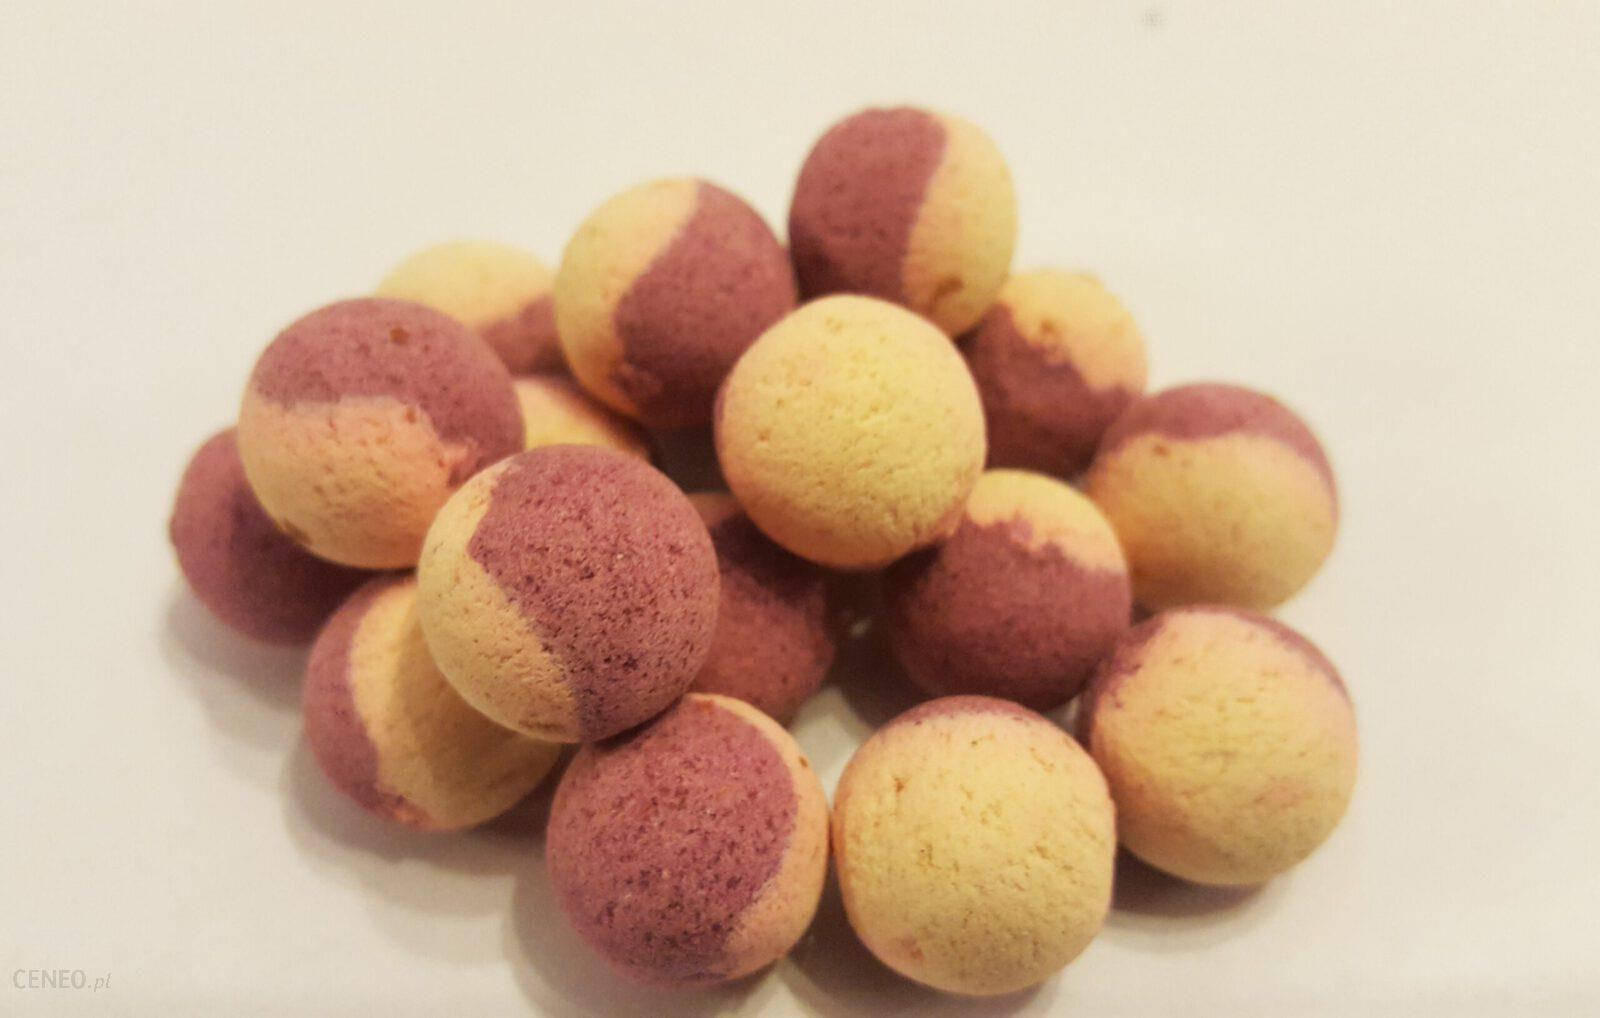 Pollard Baits Pop-Up Creamy Scopex 16Mm Kremowy Scopex